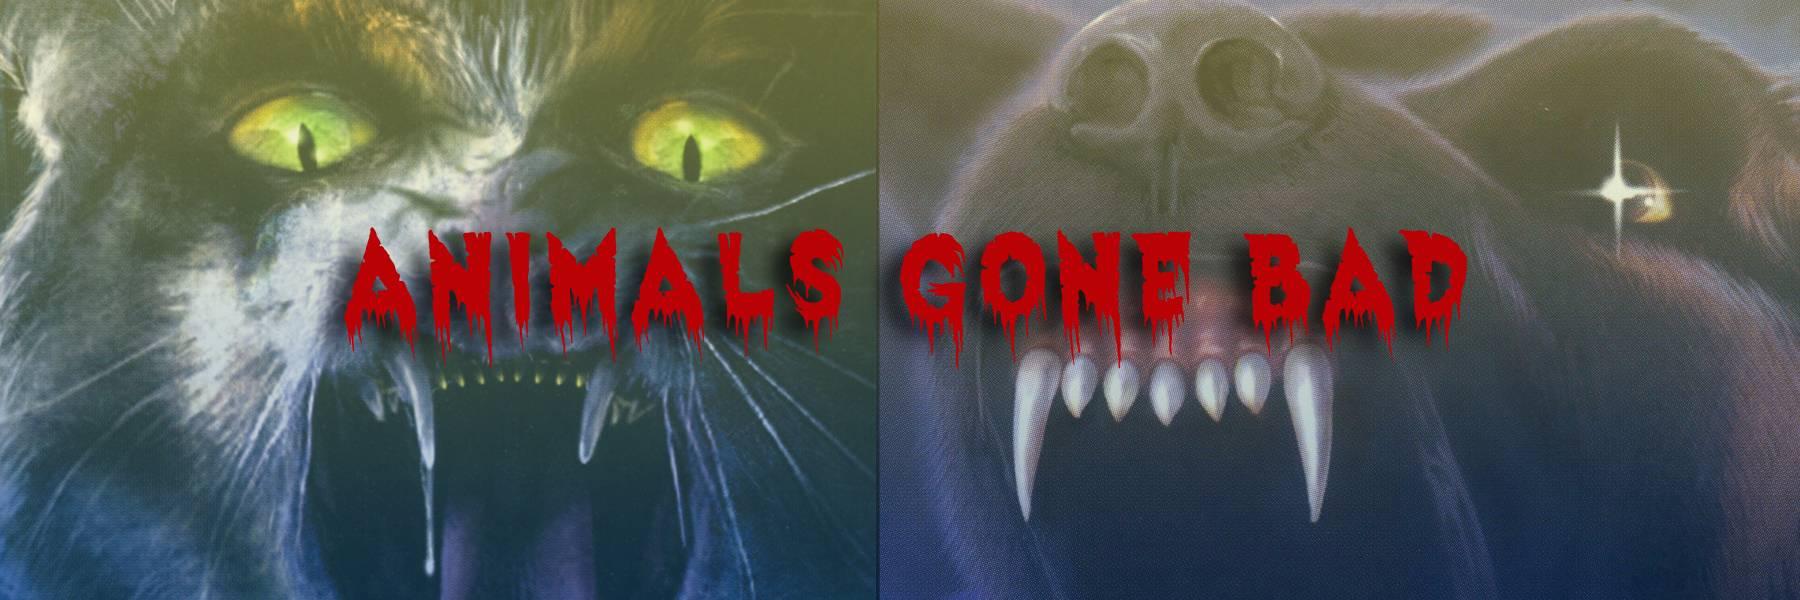 Animals Gone Bad